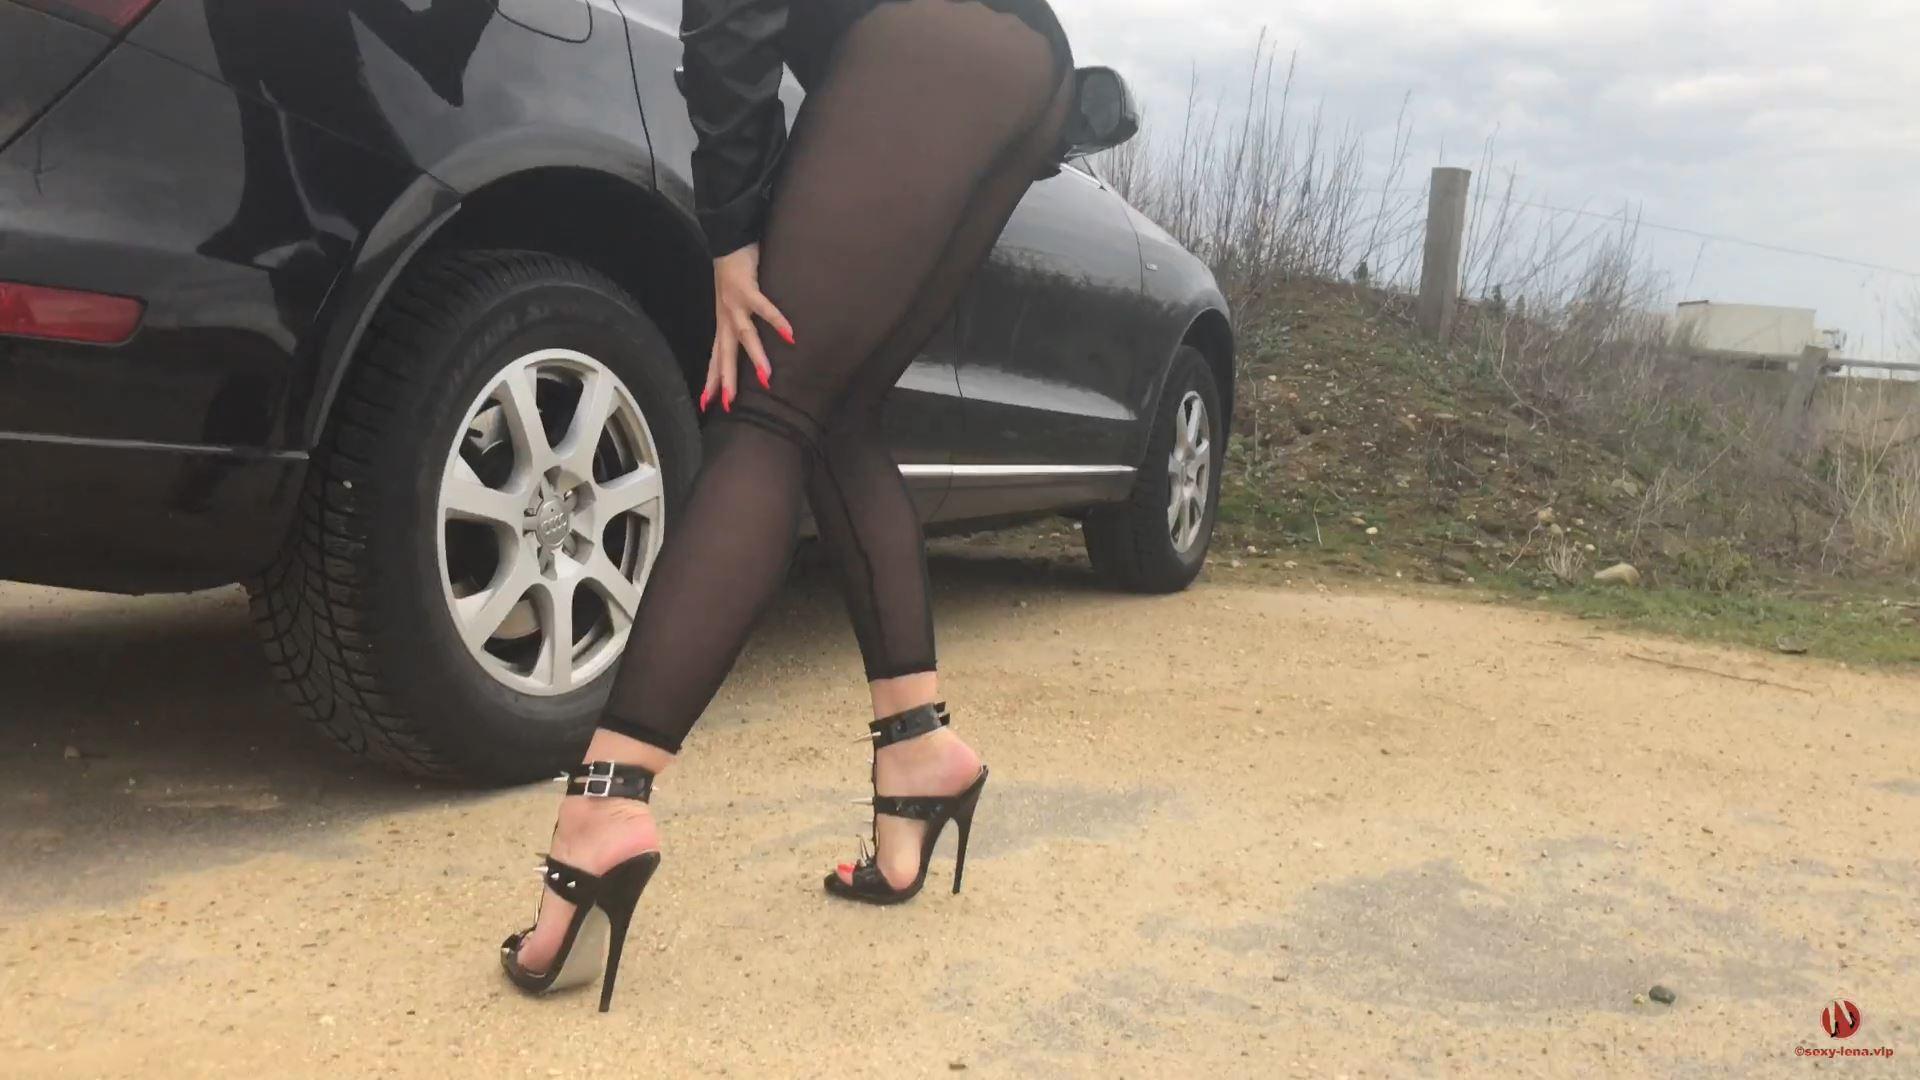 Fetish Model Lena In Scene: Killer Heels And Pedal Pumping - SEXY LENA VIP - FULL HD/1080p/MP4